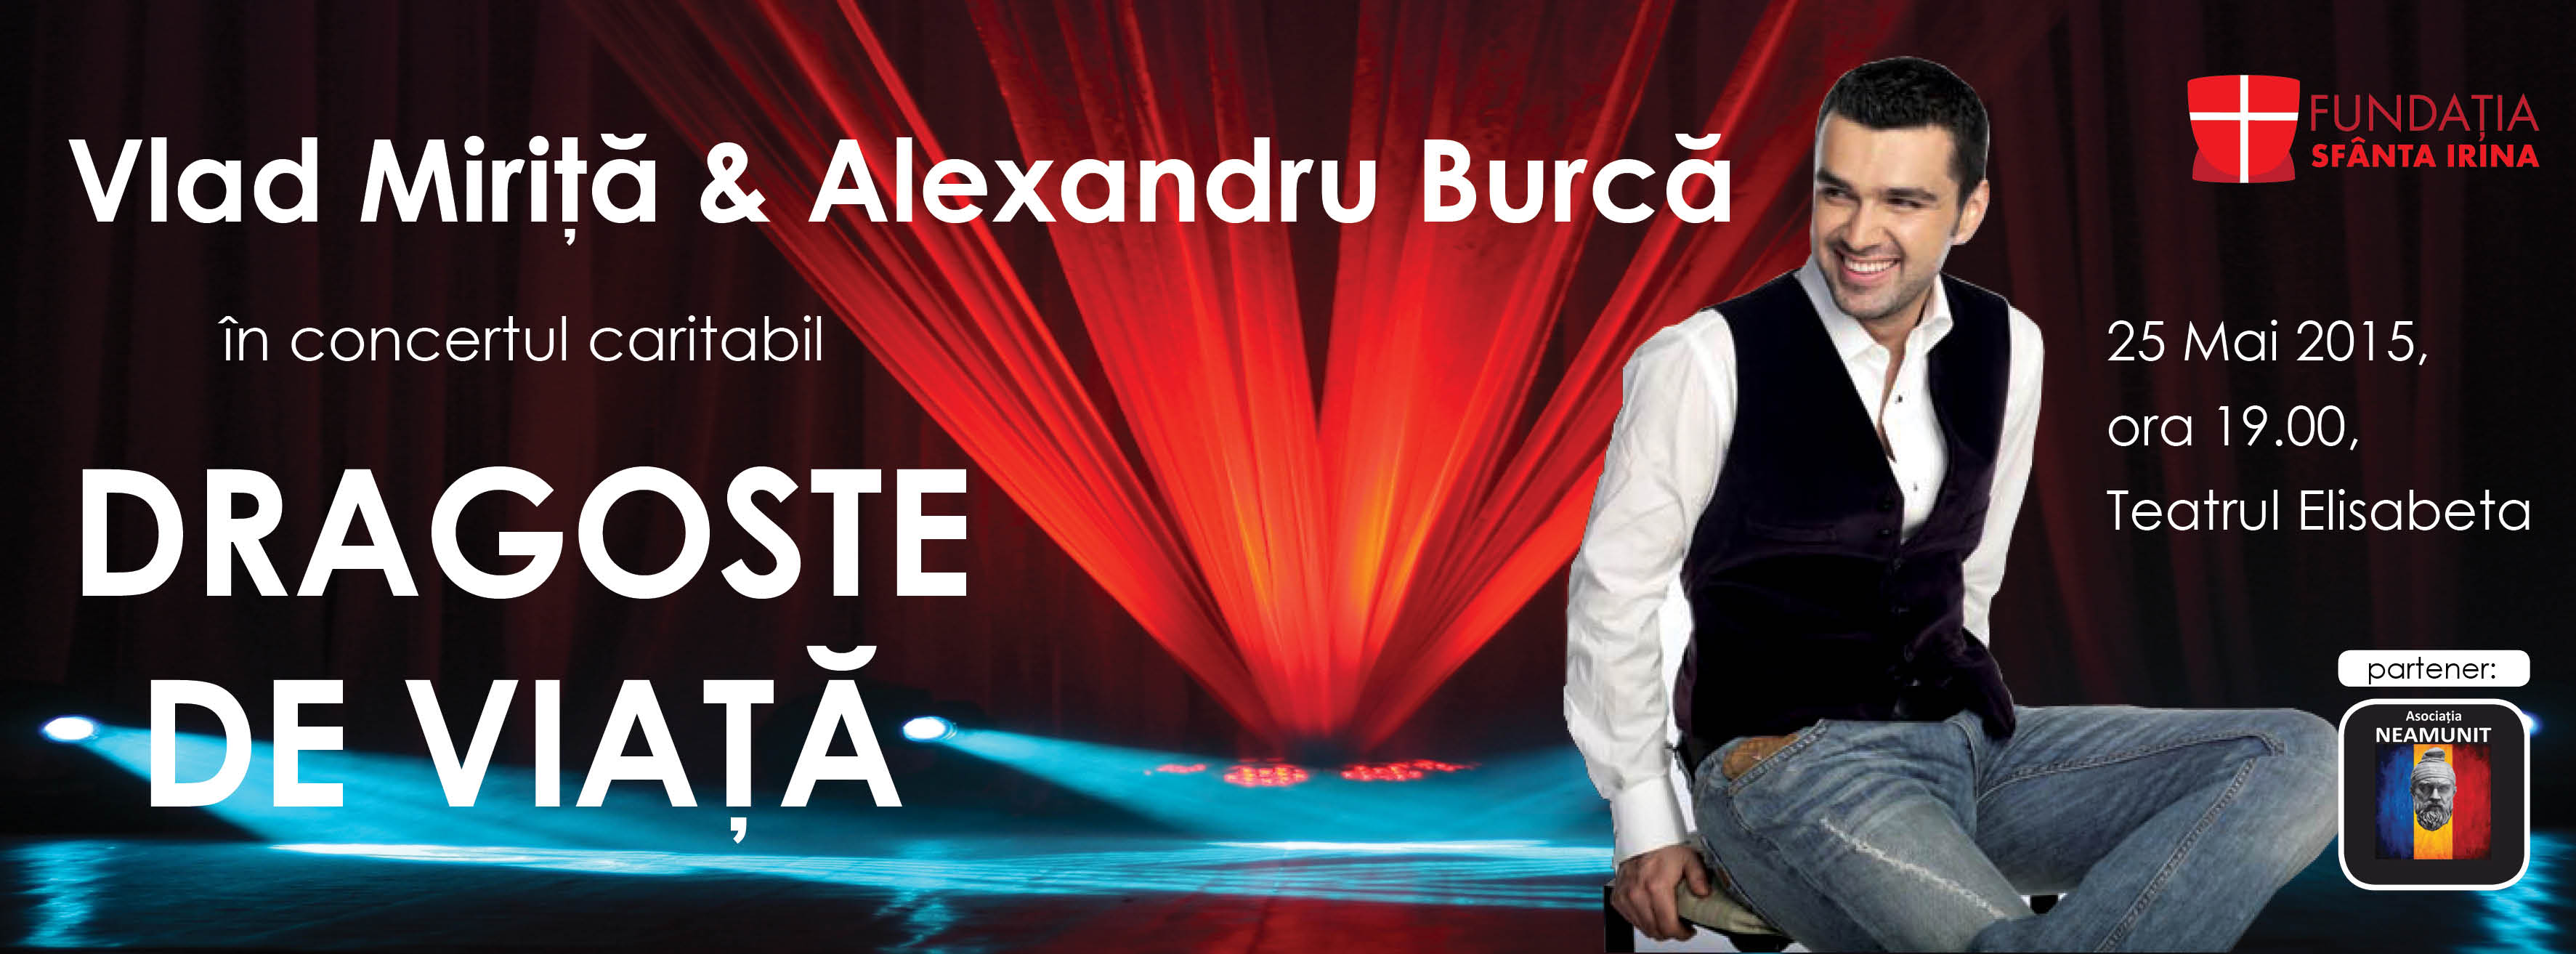 Vlad Mirita_Dragoste de viata_20.05.2015_event cover facebook_